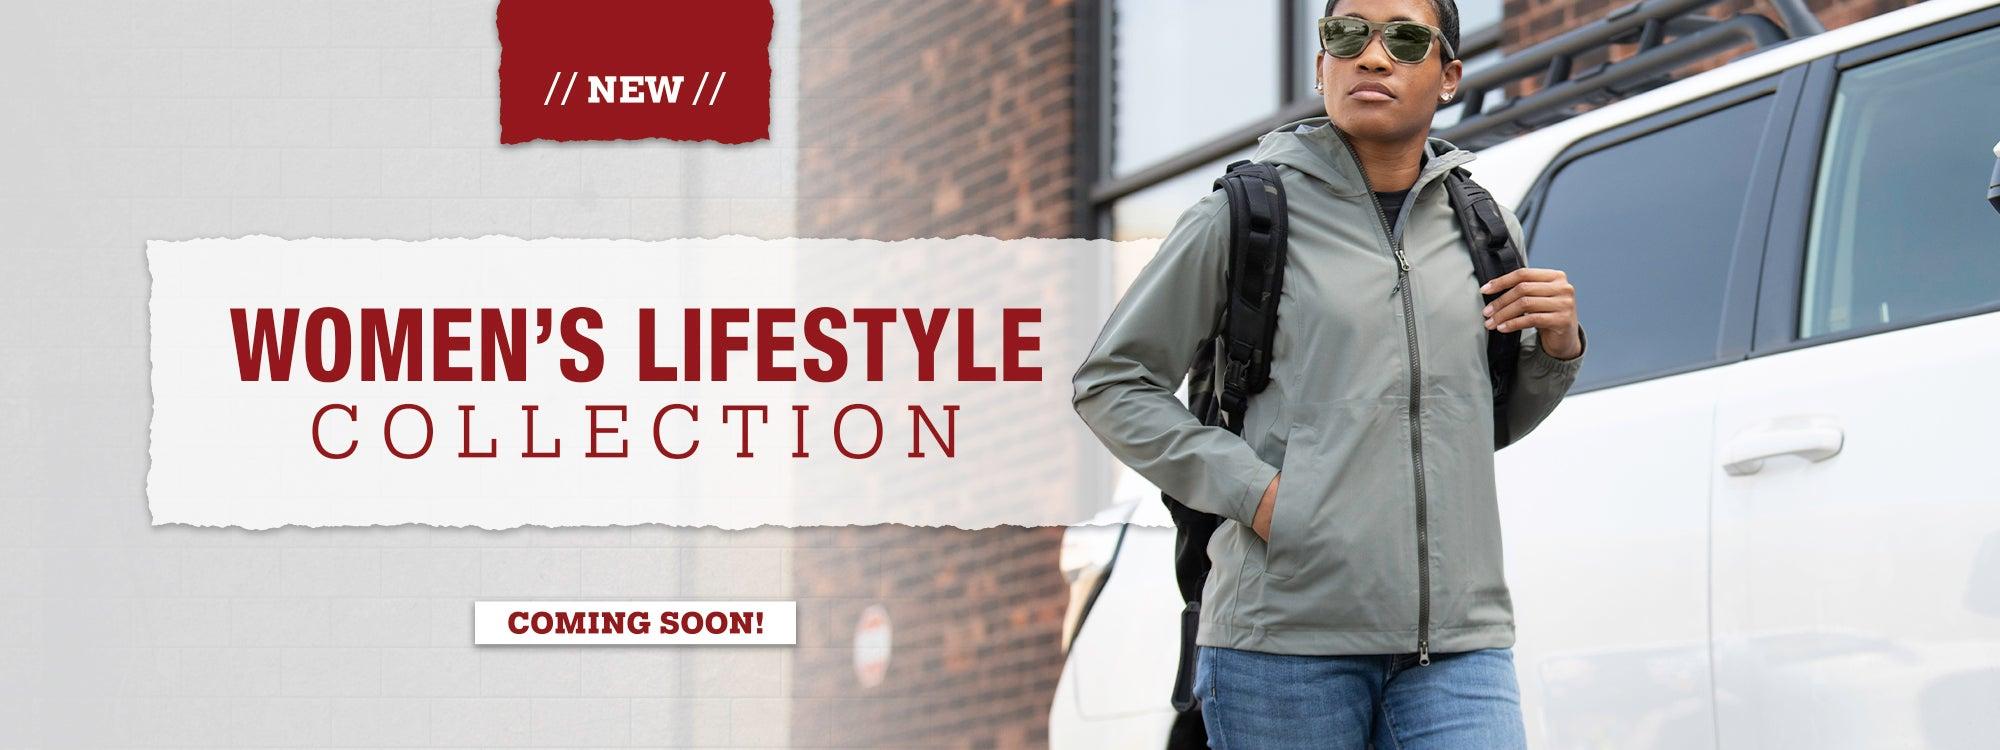 VErtx Women's Lifestyle Collection